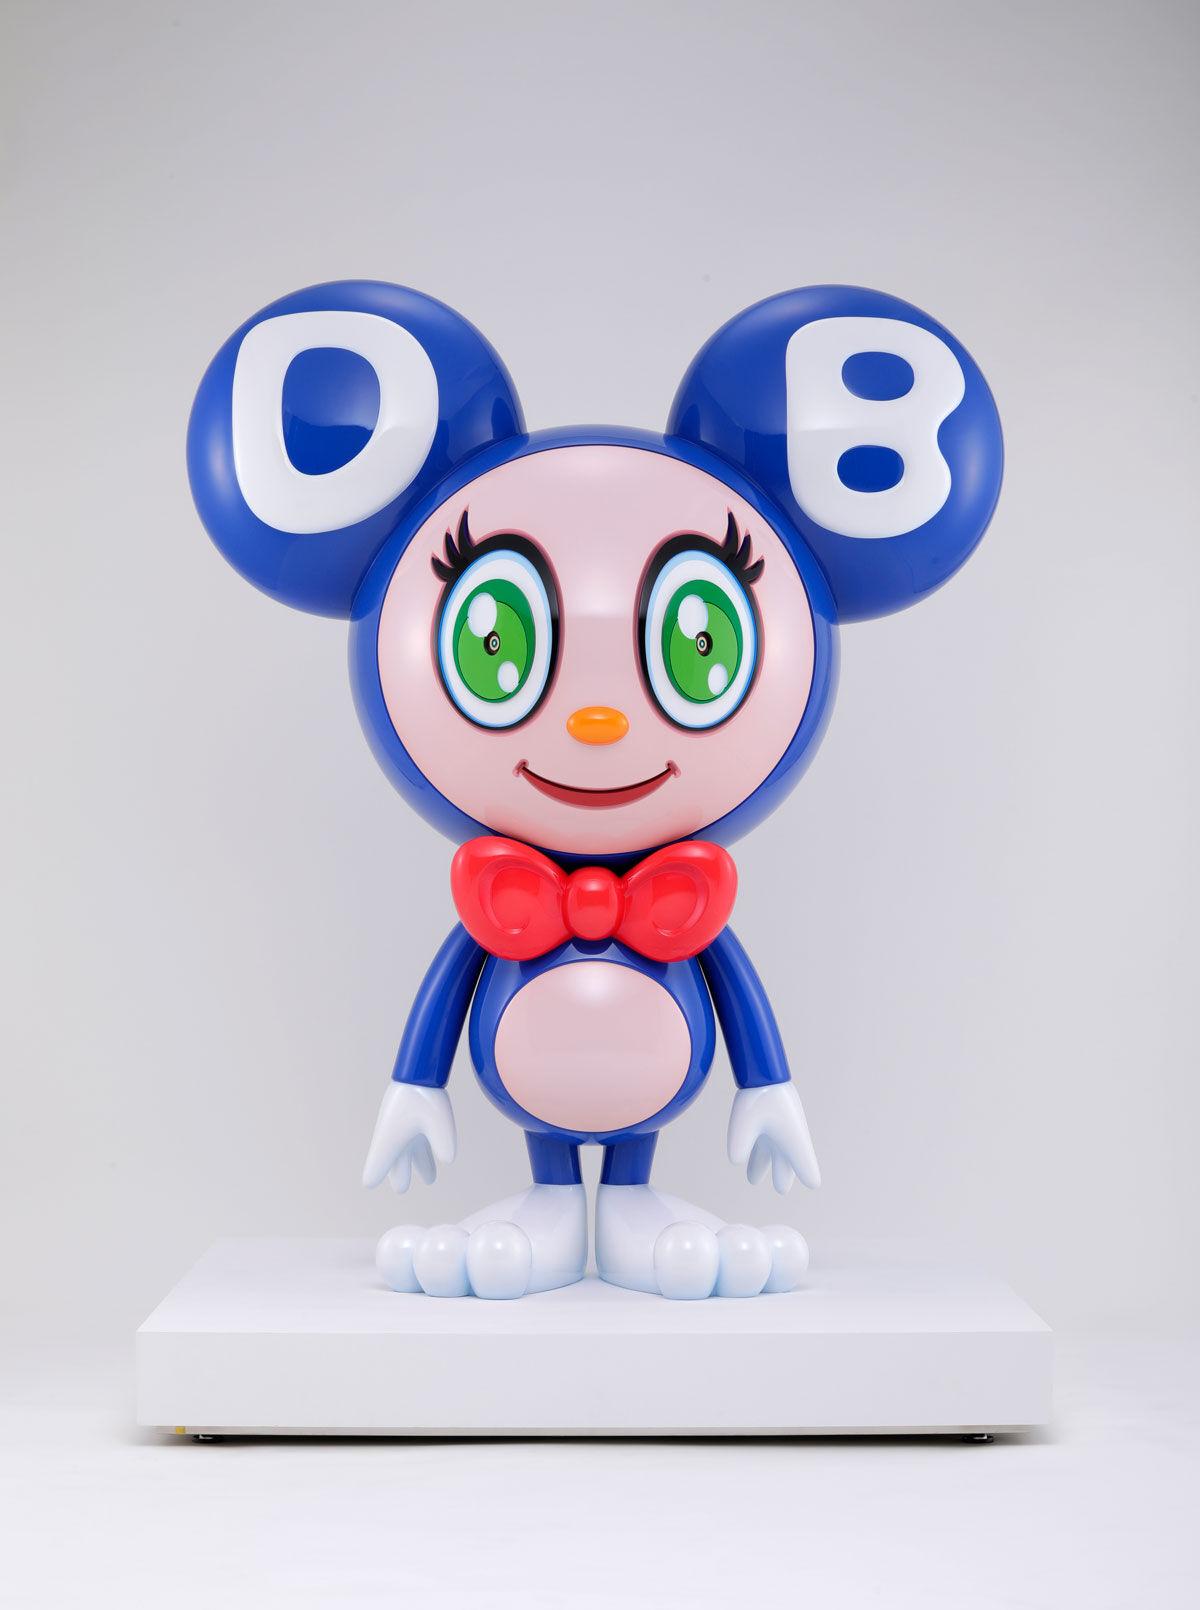 Takashi Murakami, Mr. DOB, 2019. ©︎ 2019 Takashi Murakami/Kaikai Kiki Co., Ltd. All Rights Reserved. Courtesy of Gagosian.